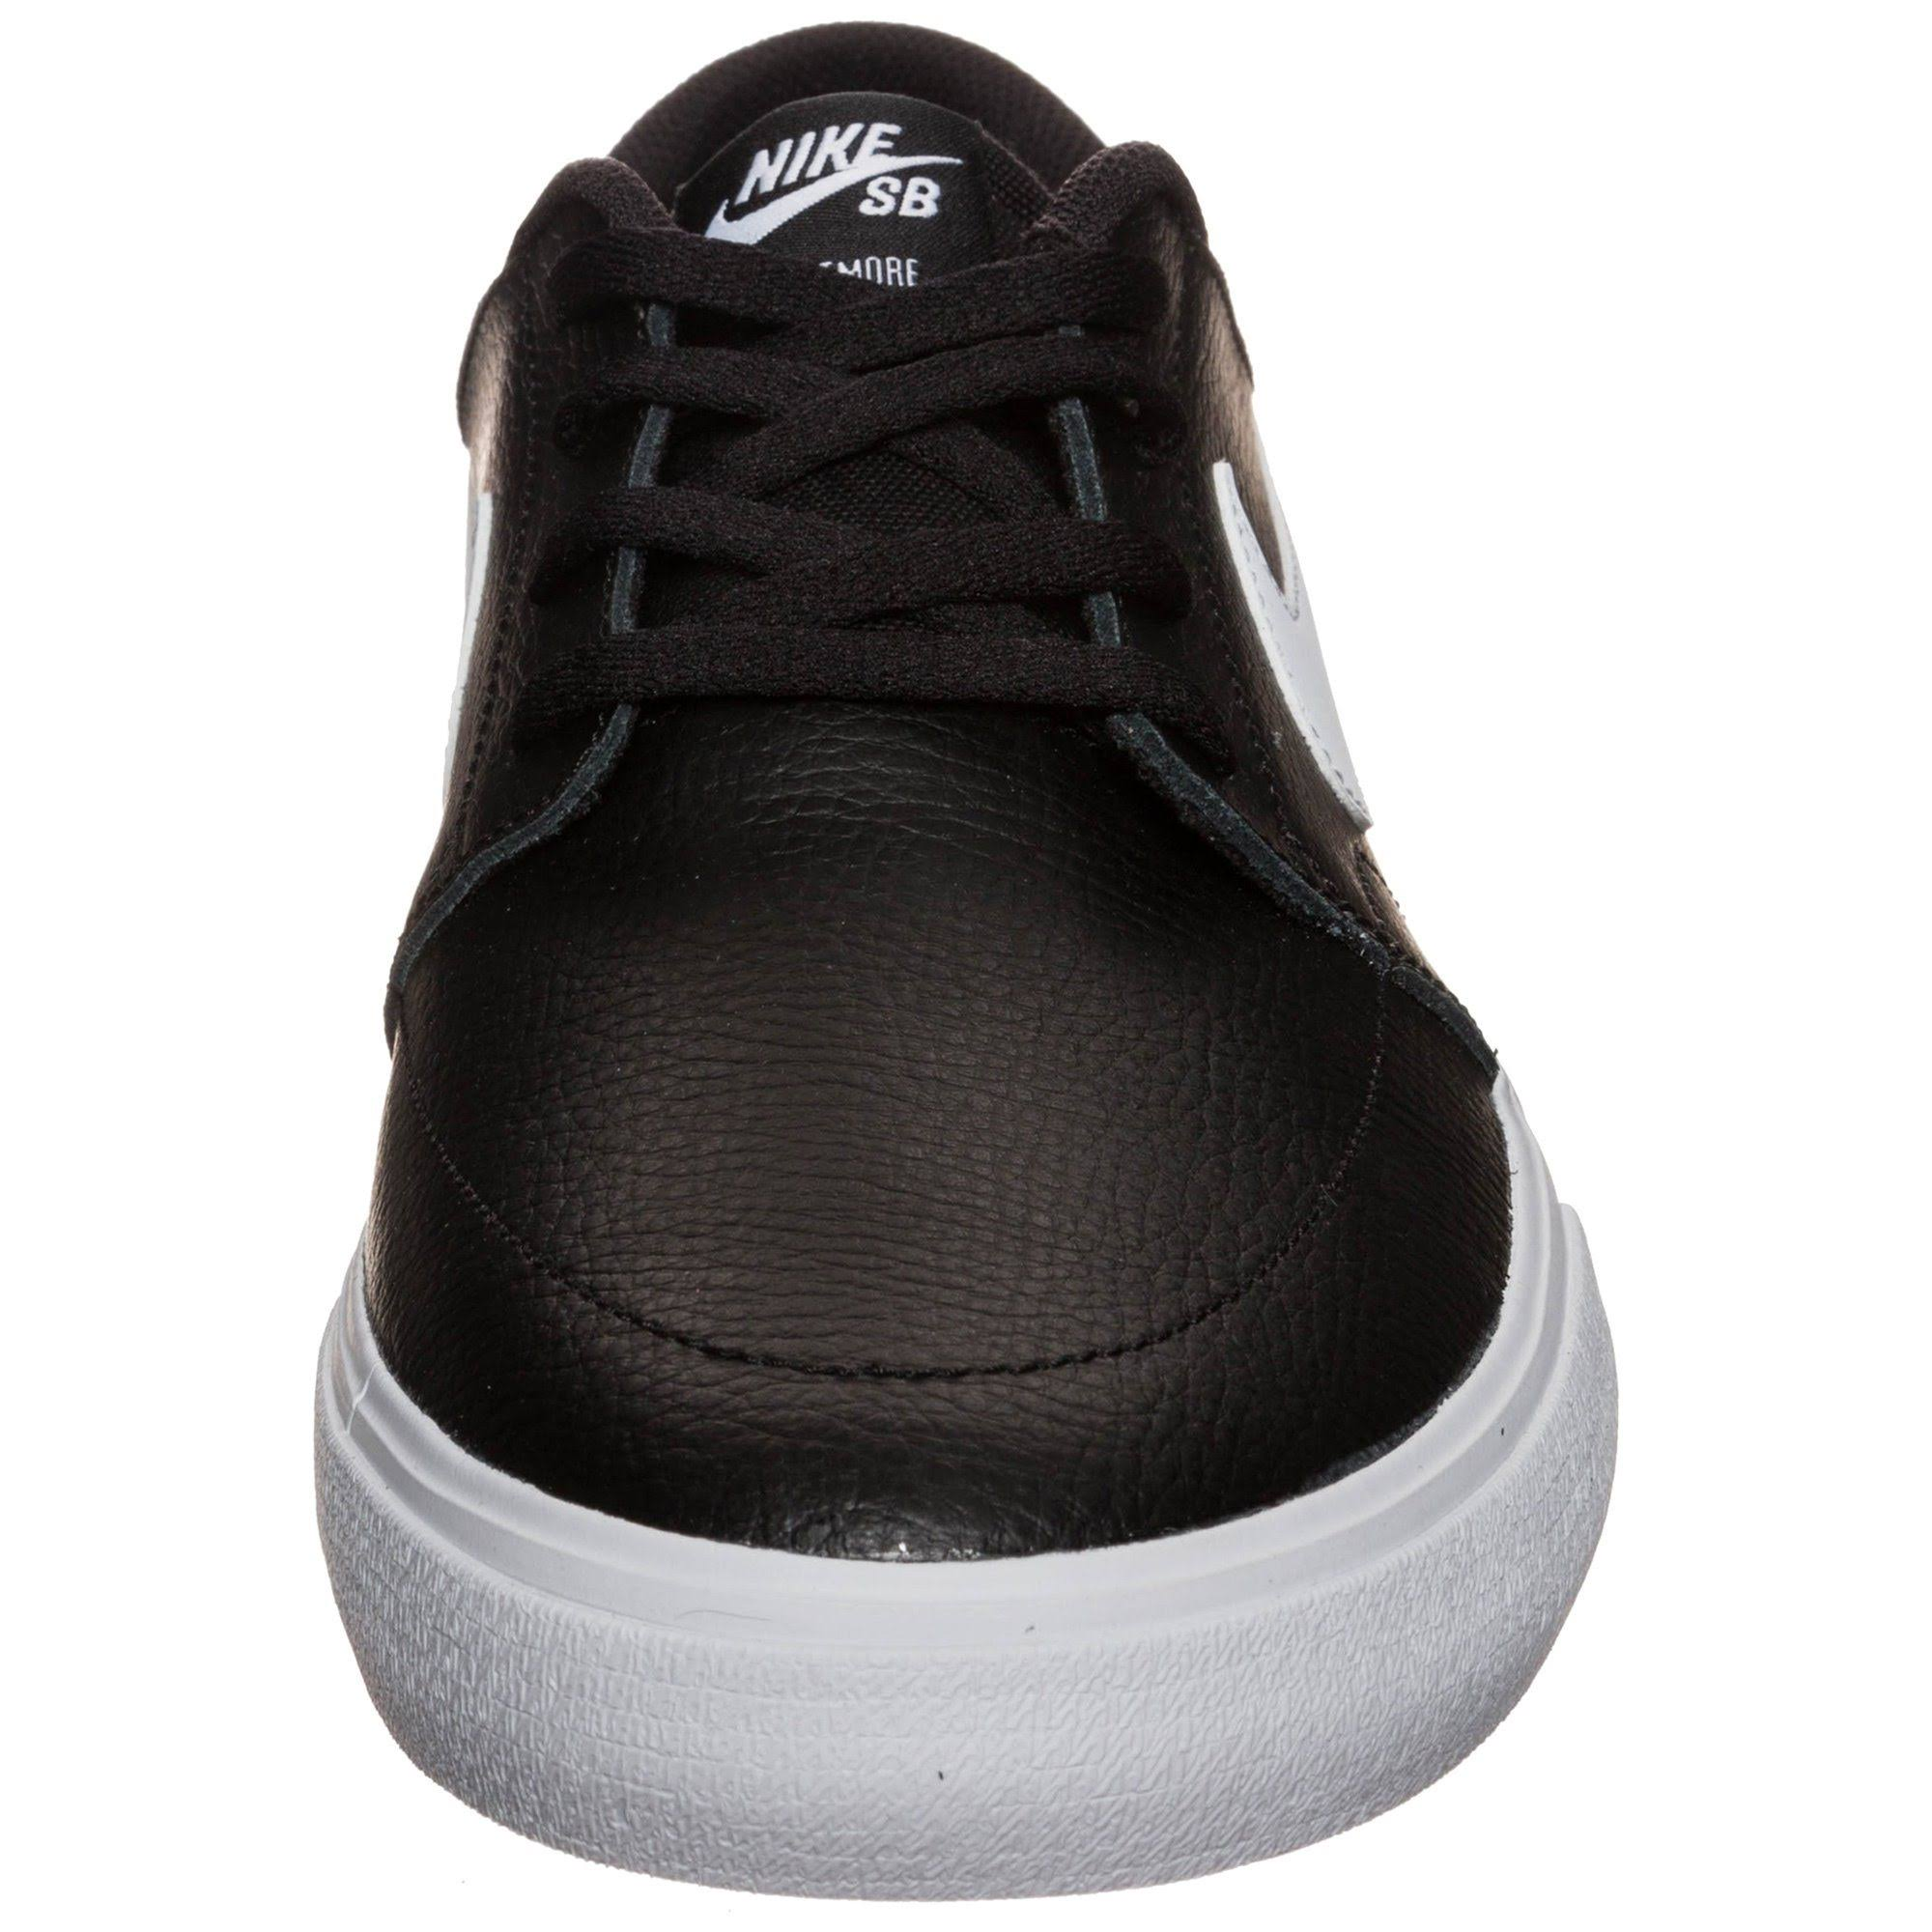 4 Prm Schwarz Portmore Zehenkappen Solar Ii Nike Buty Sb black UwzUPg